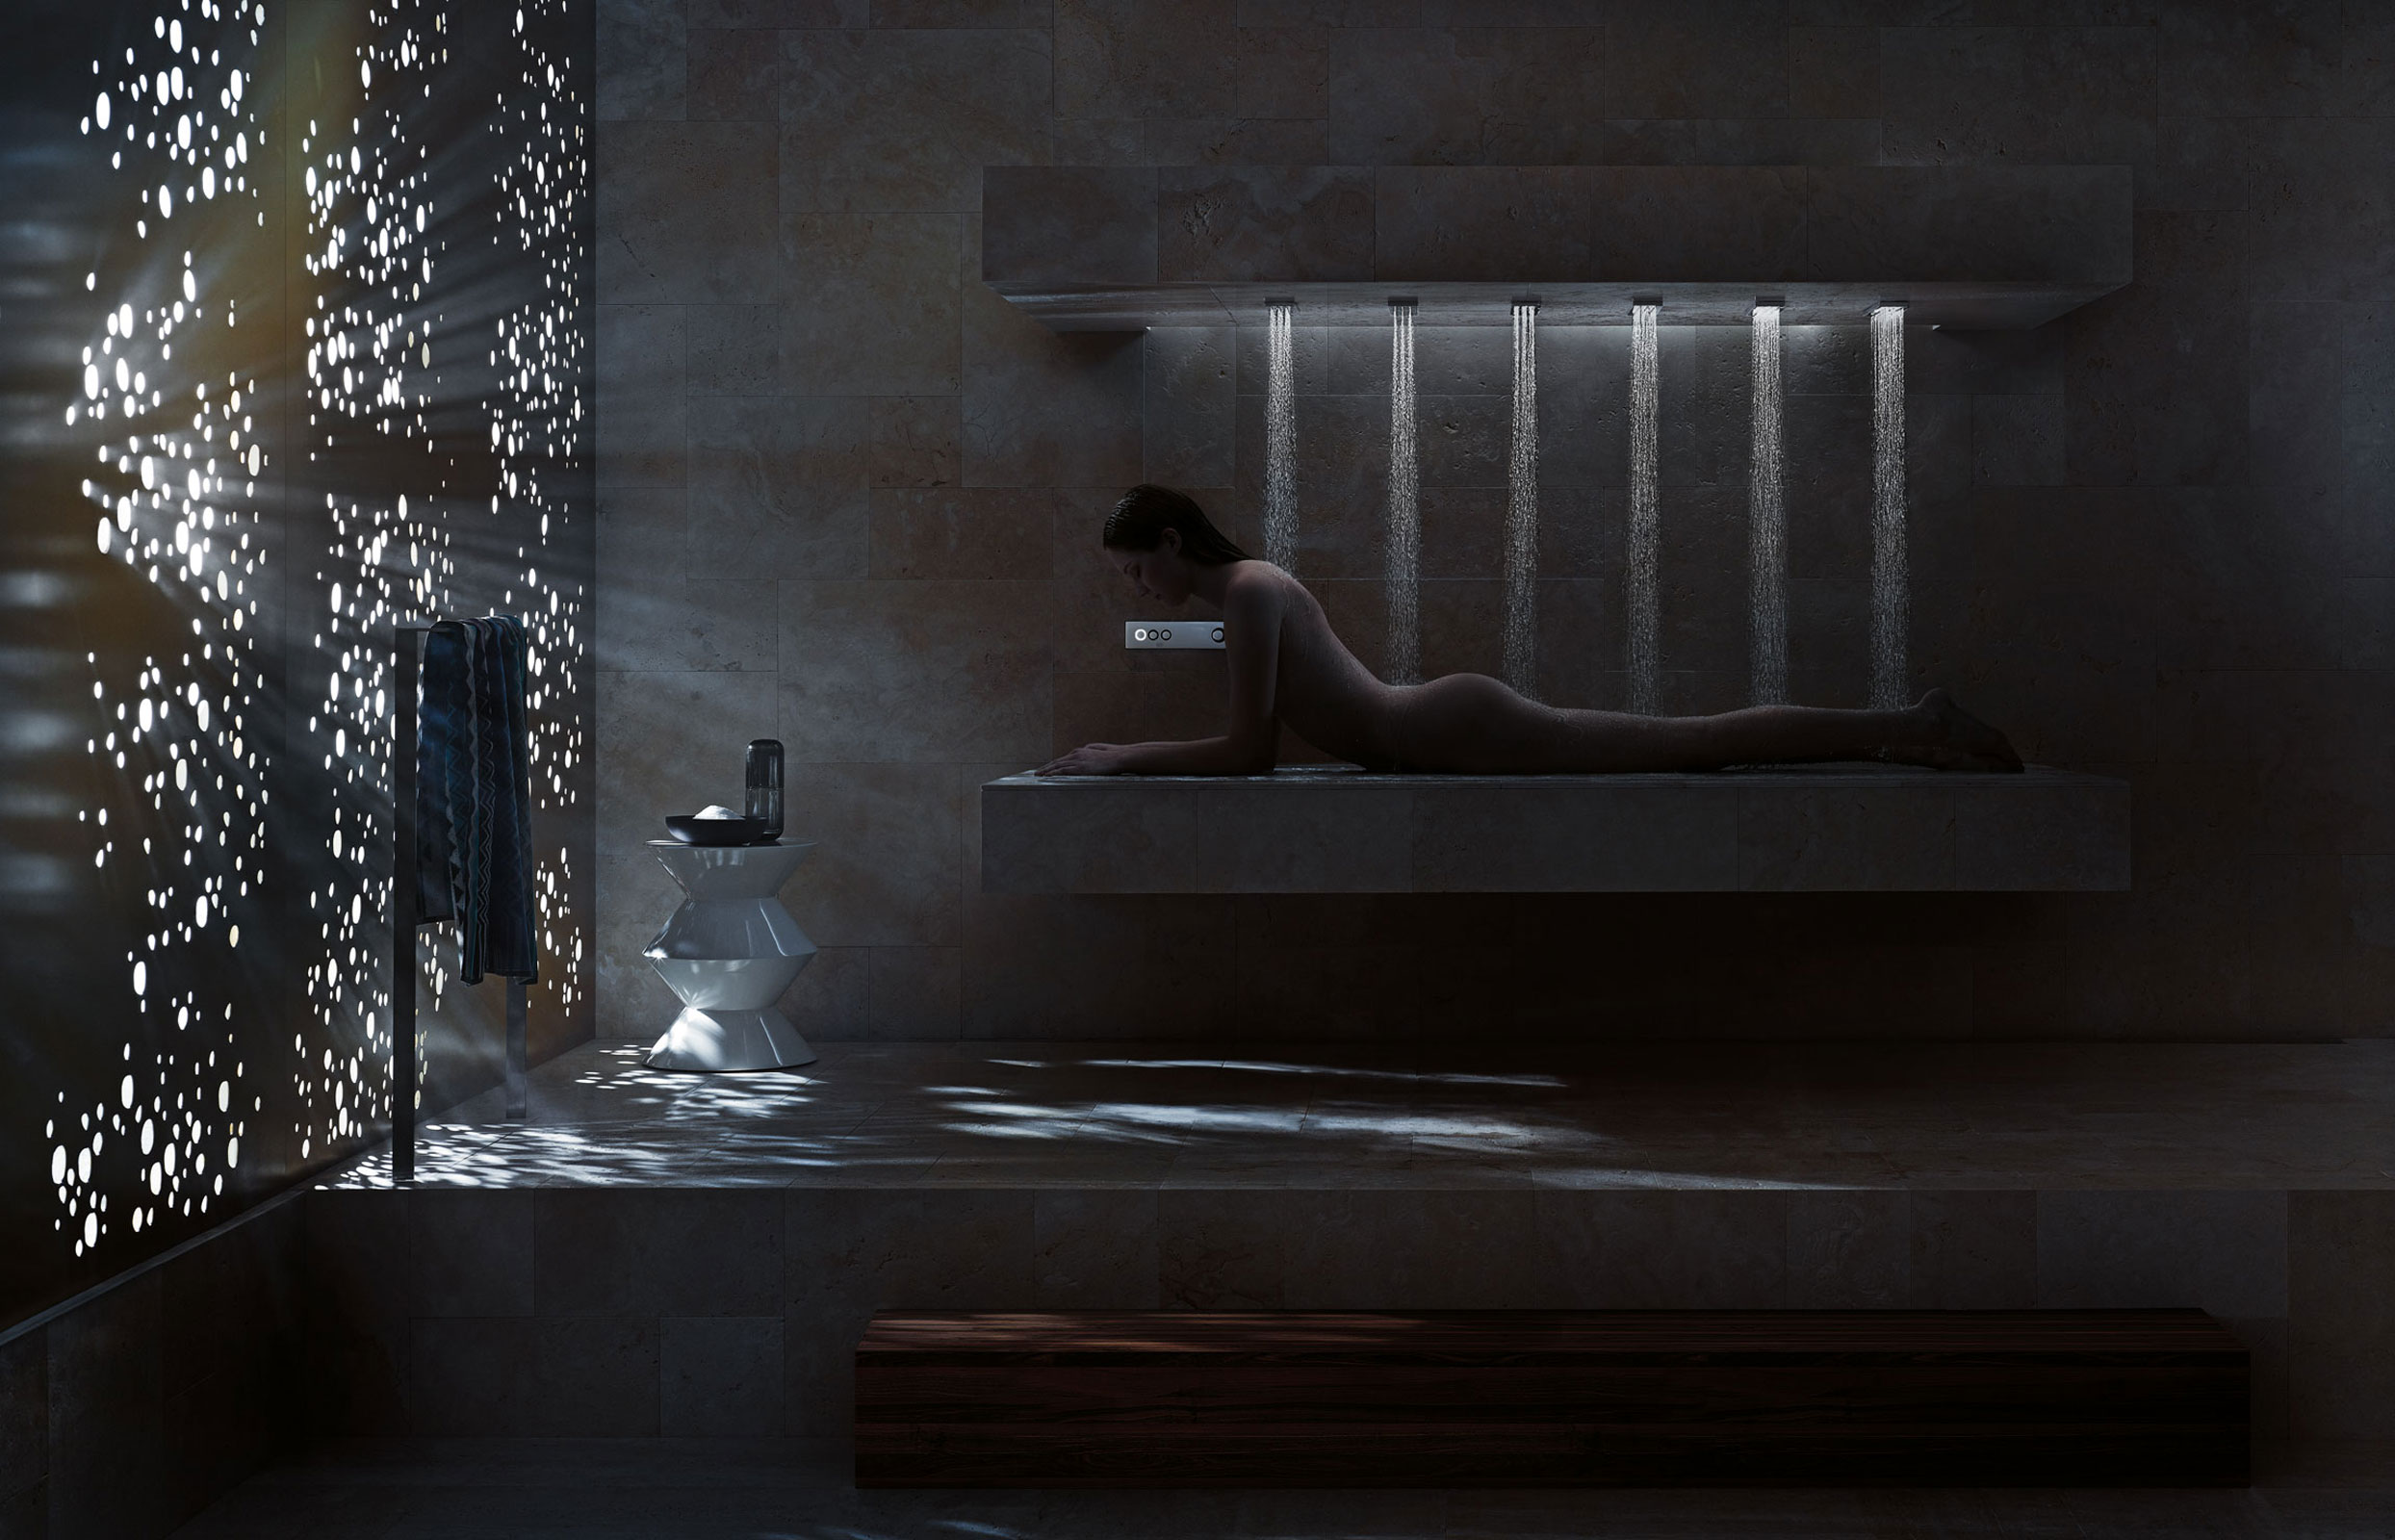 horizontal shower by dornbracht will rejuvenate your body extravaganzi. Black Bedroom Furniture Sets. Home Design Ideas